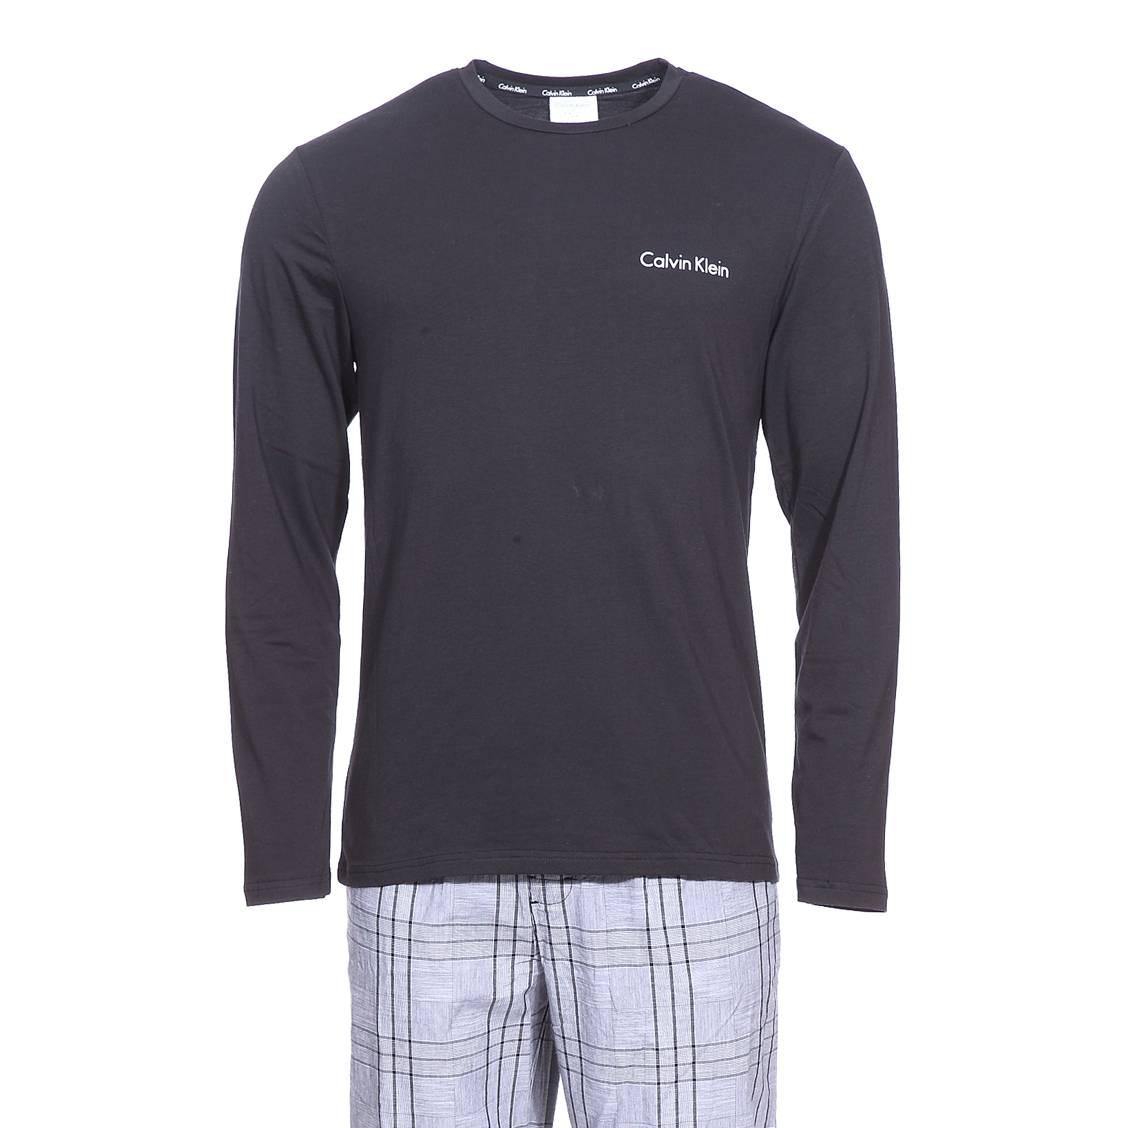 Pyjama homme calvin klein jusqu 60 soldes deuxi me - Tee shirt manche longue calvin klein ...